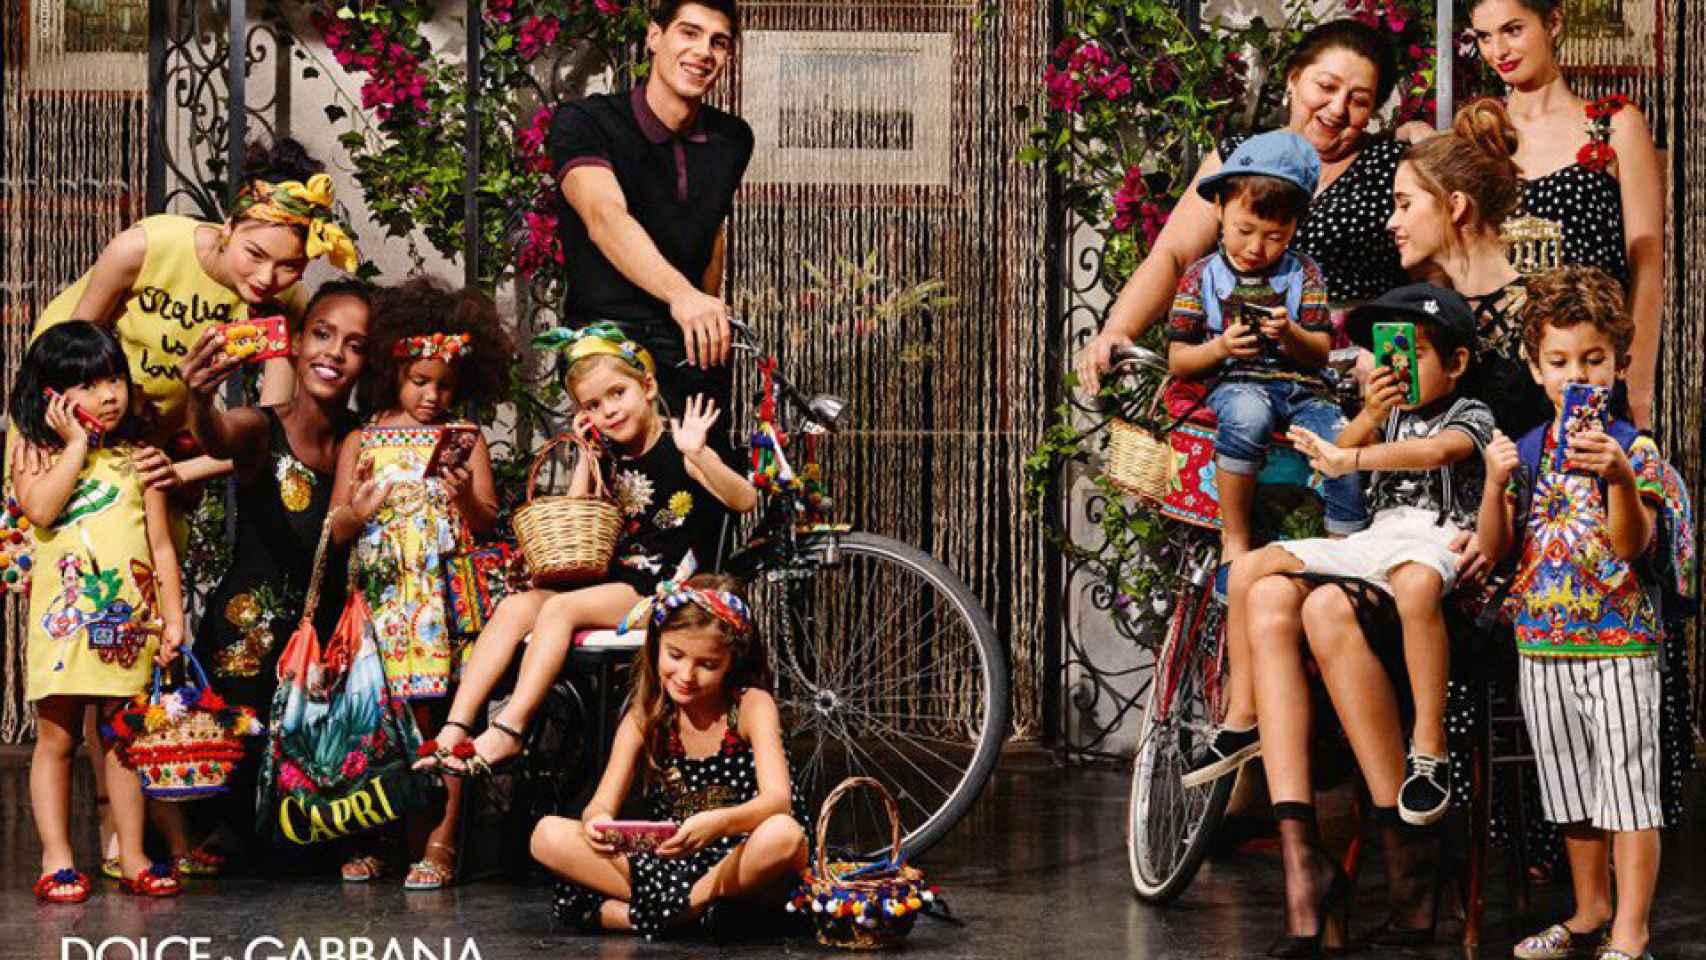 Campaña primavera-verano 2016 de Dolce Gabbana.